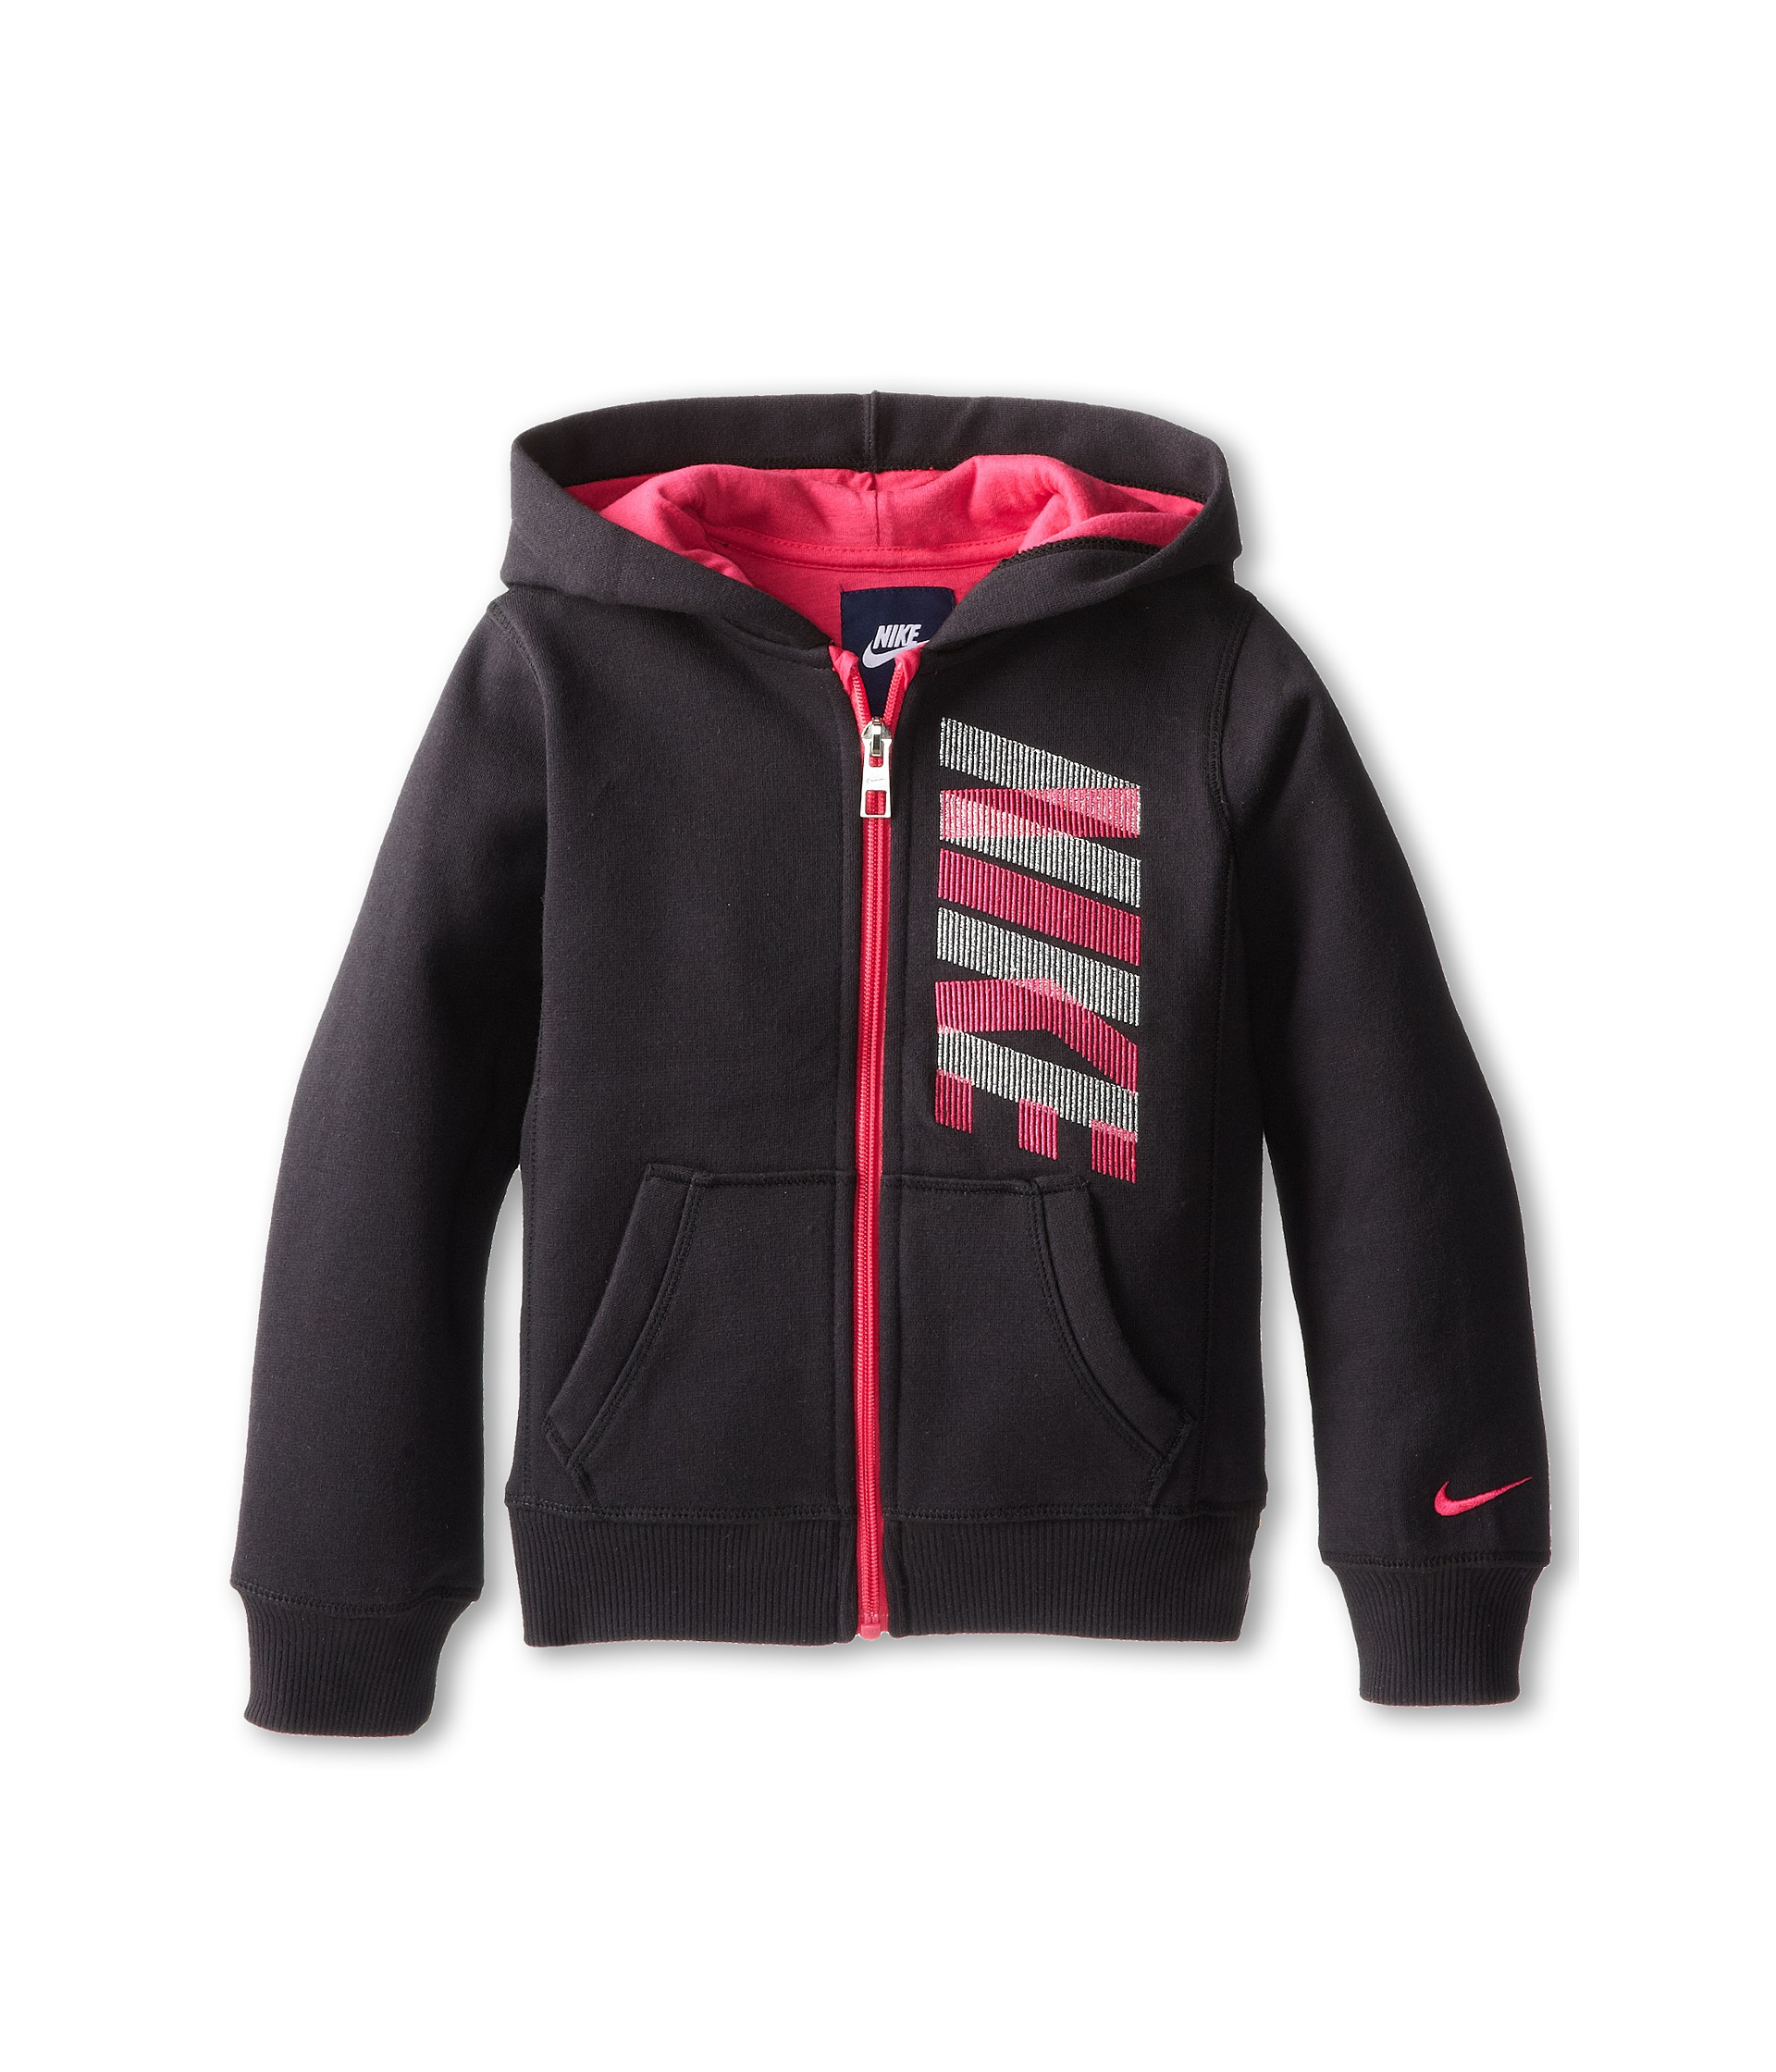 Nike Kids Nike Full Zip Hoodie Little Kids | Shipped Free ...